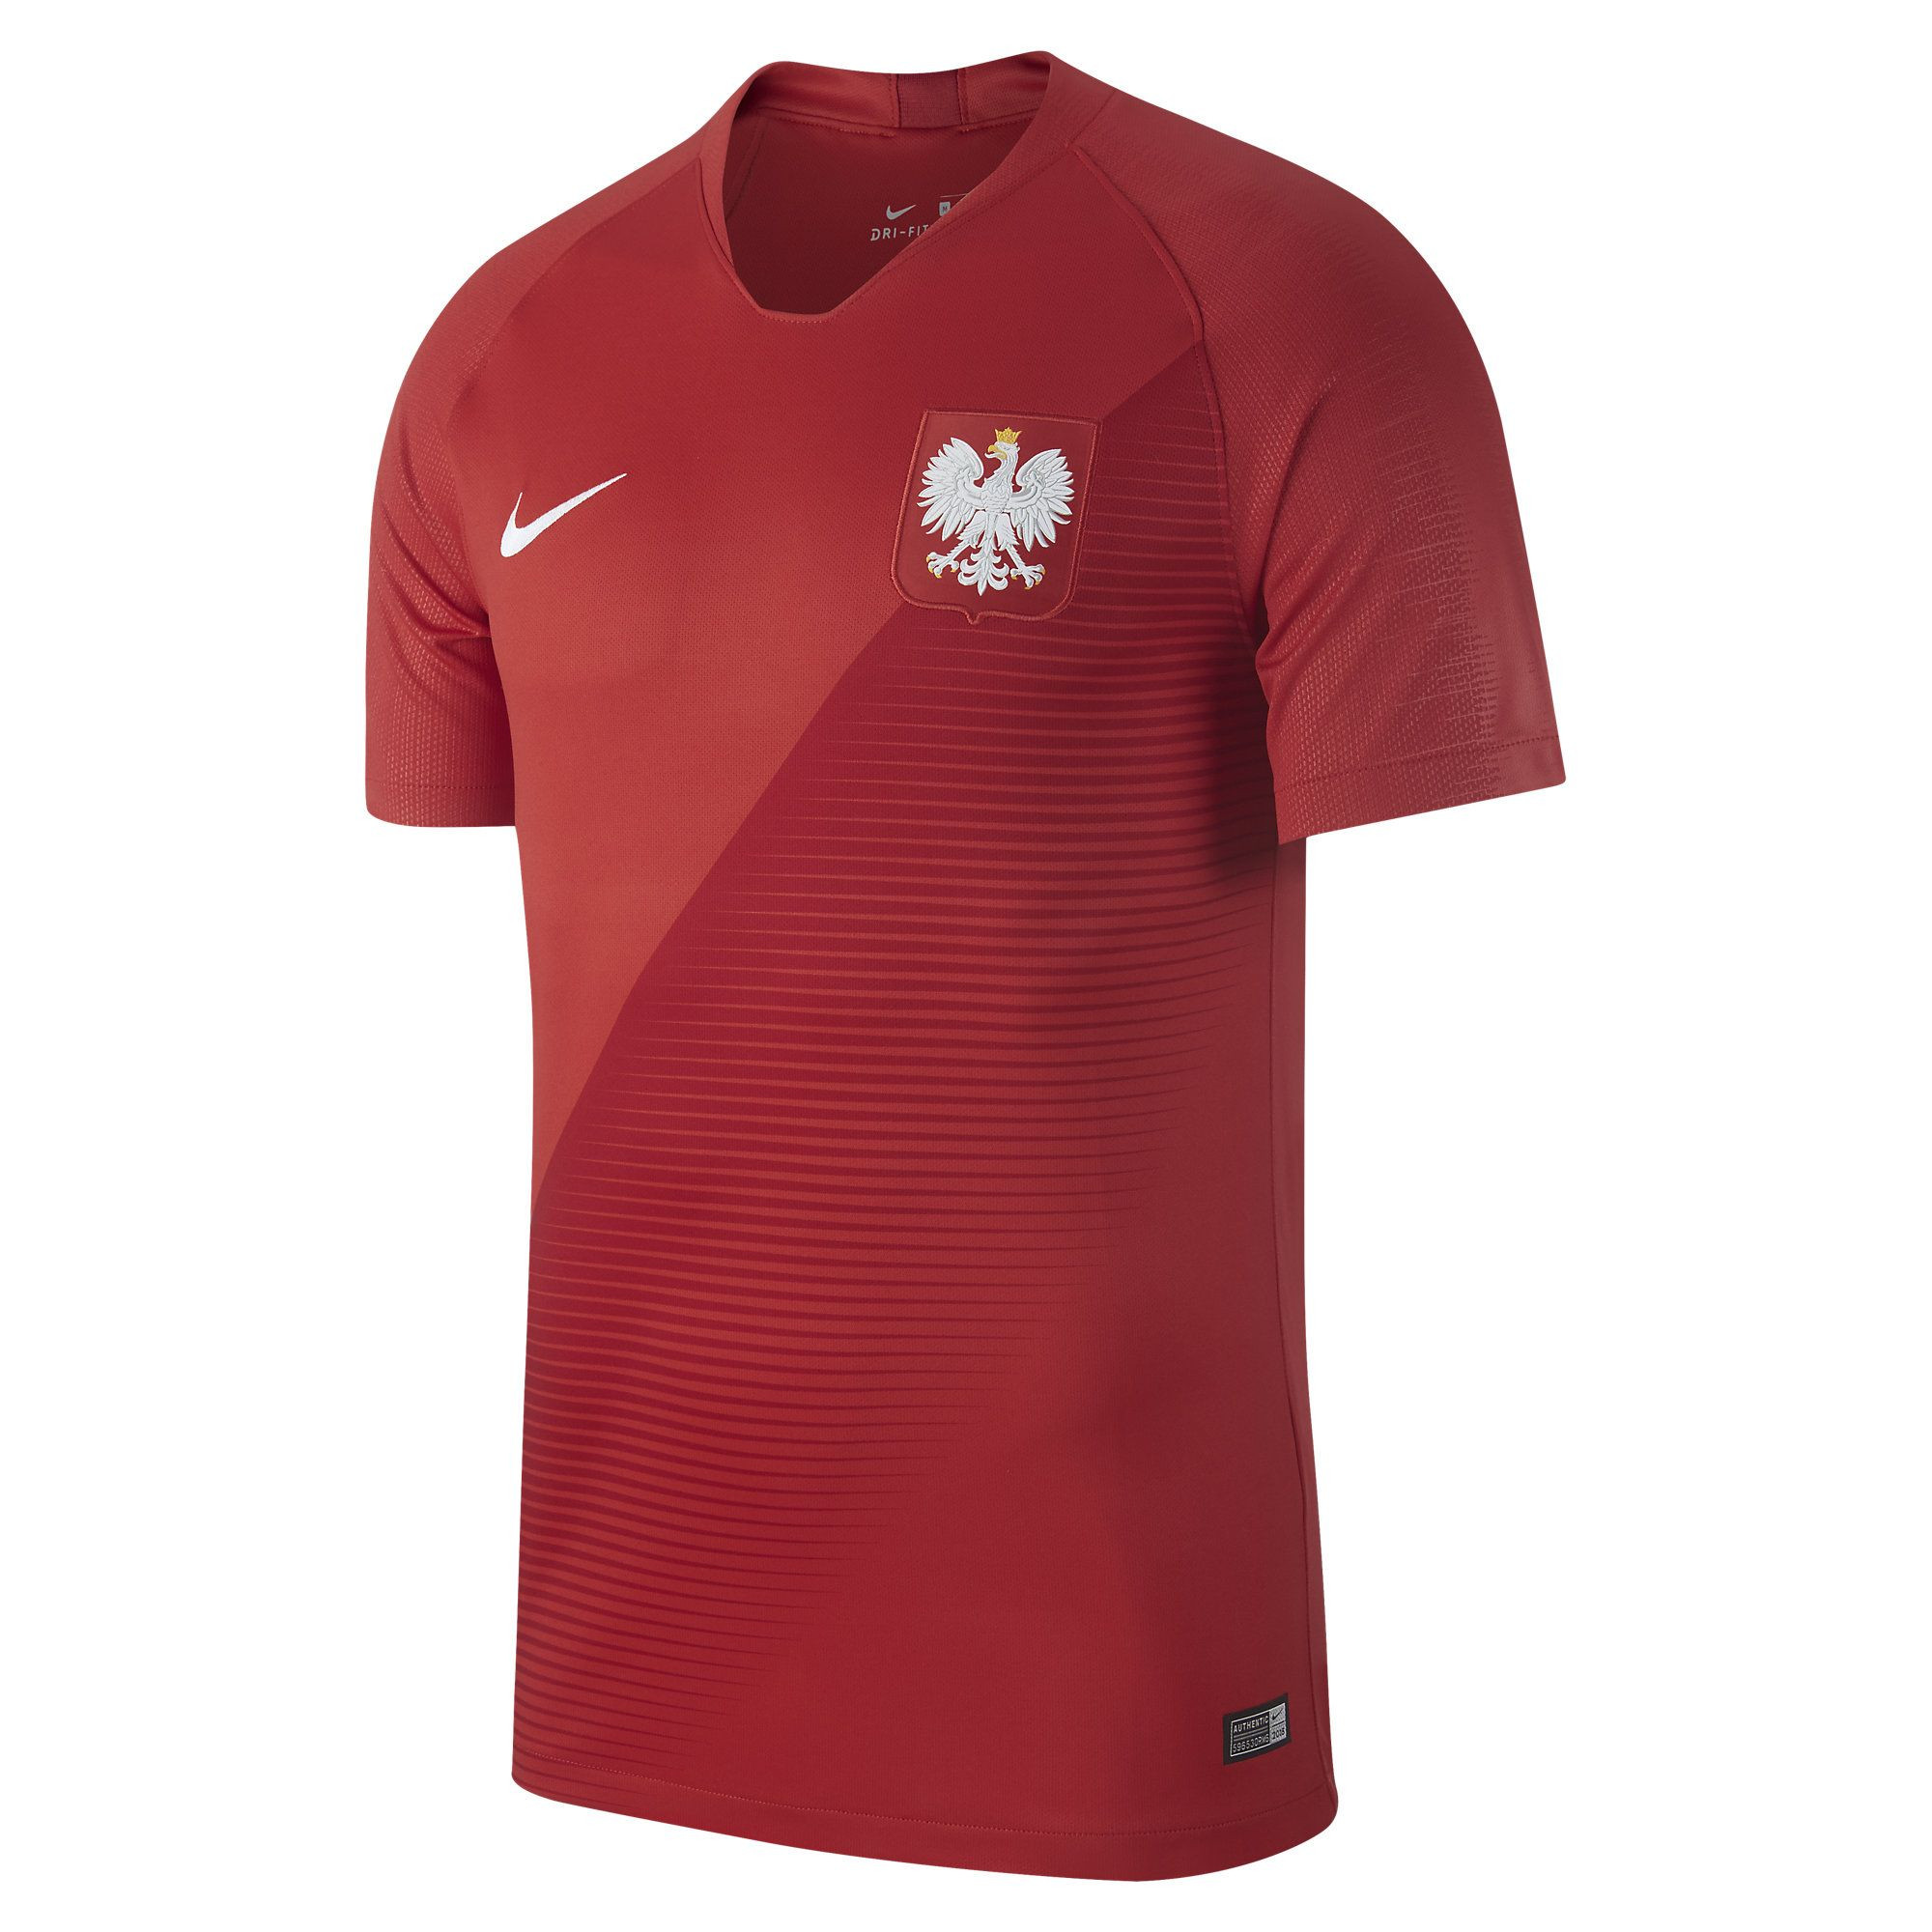 7ea9e6944 Koszulka Reprezentacji POLSKI / MUNDIAL -2018 r.XL - 7298086980 ...